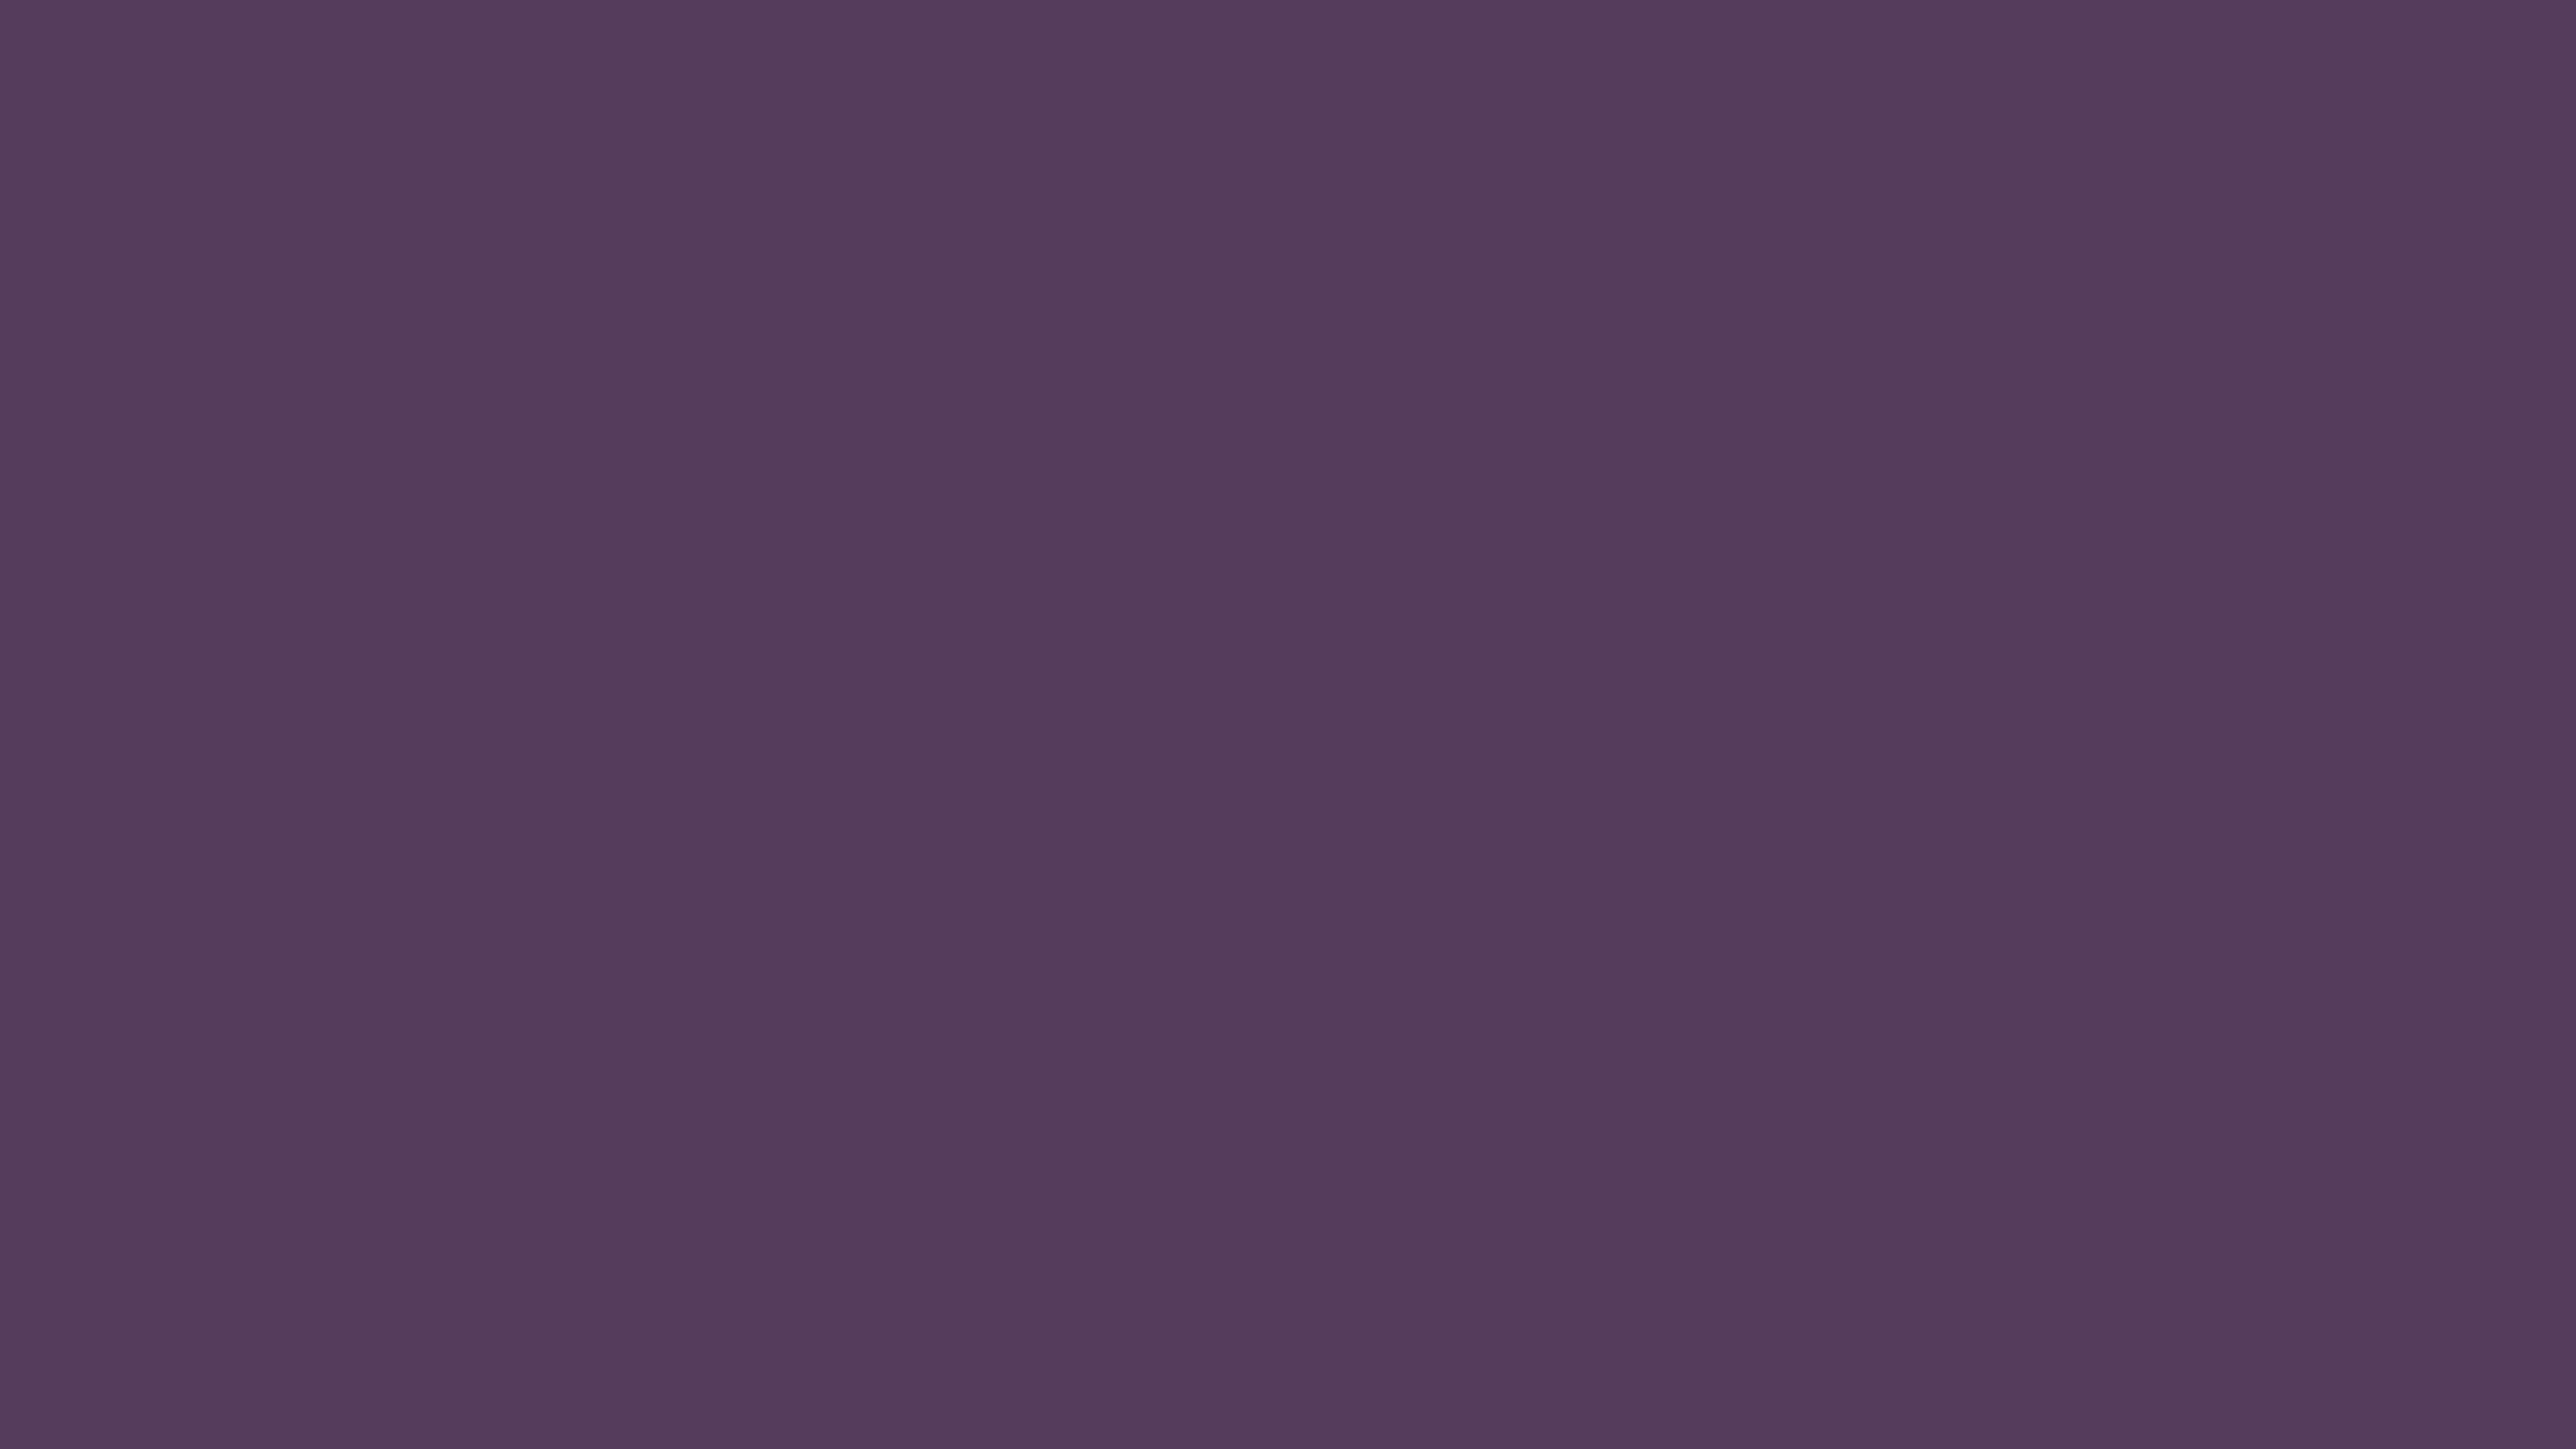 4096x2304 English Violet Solid Color Background